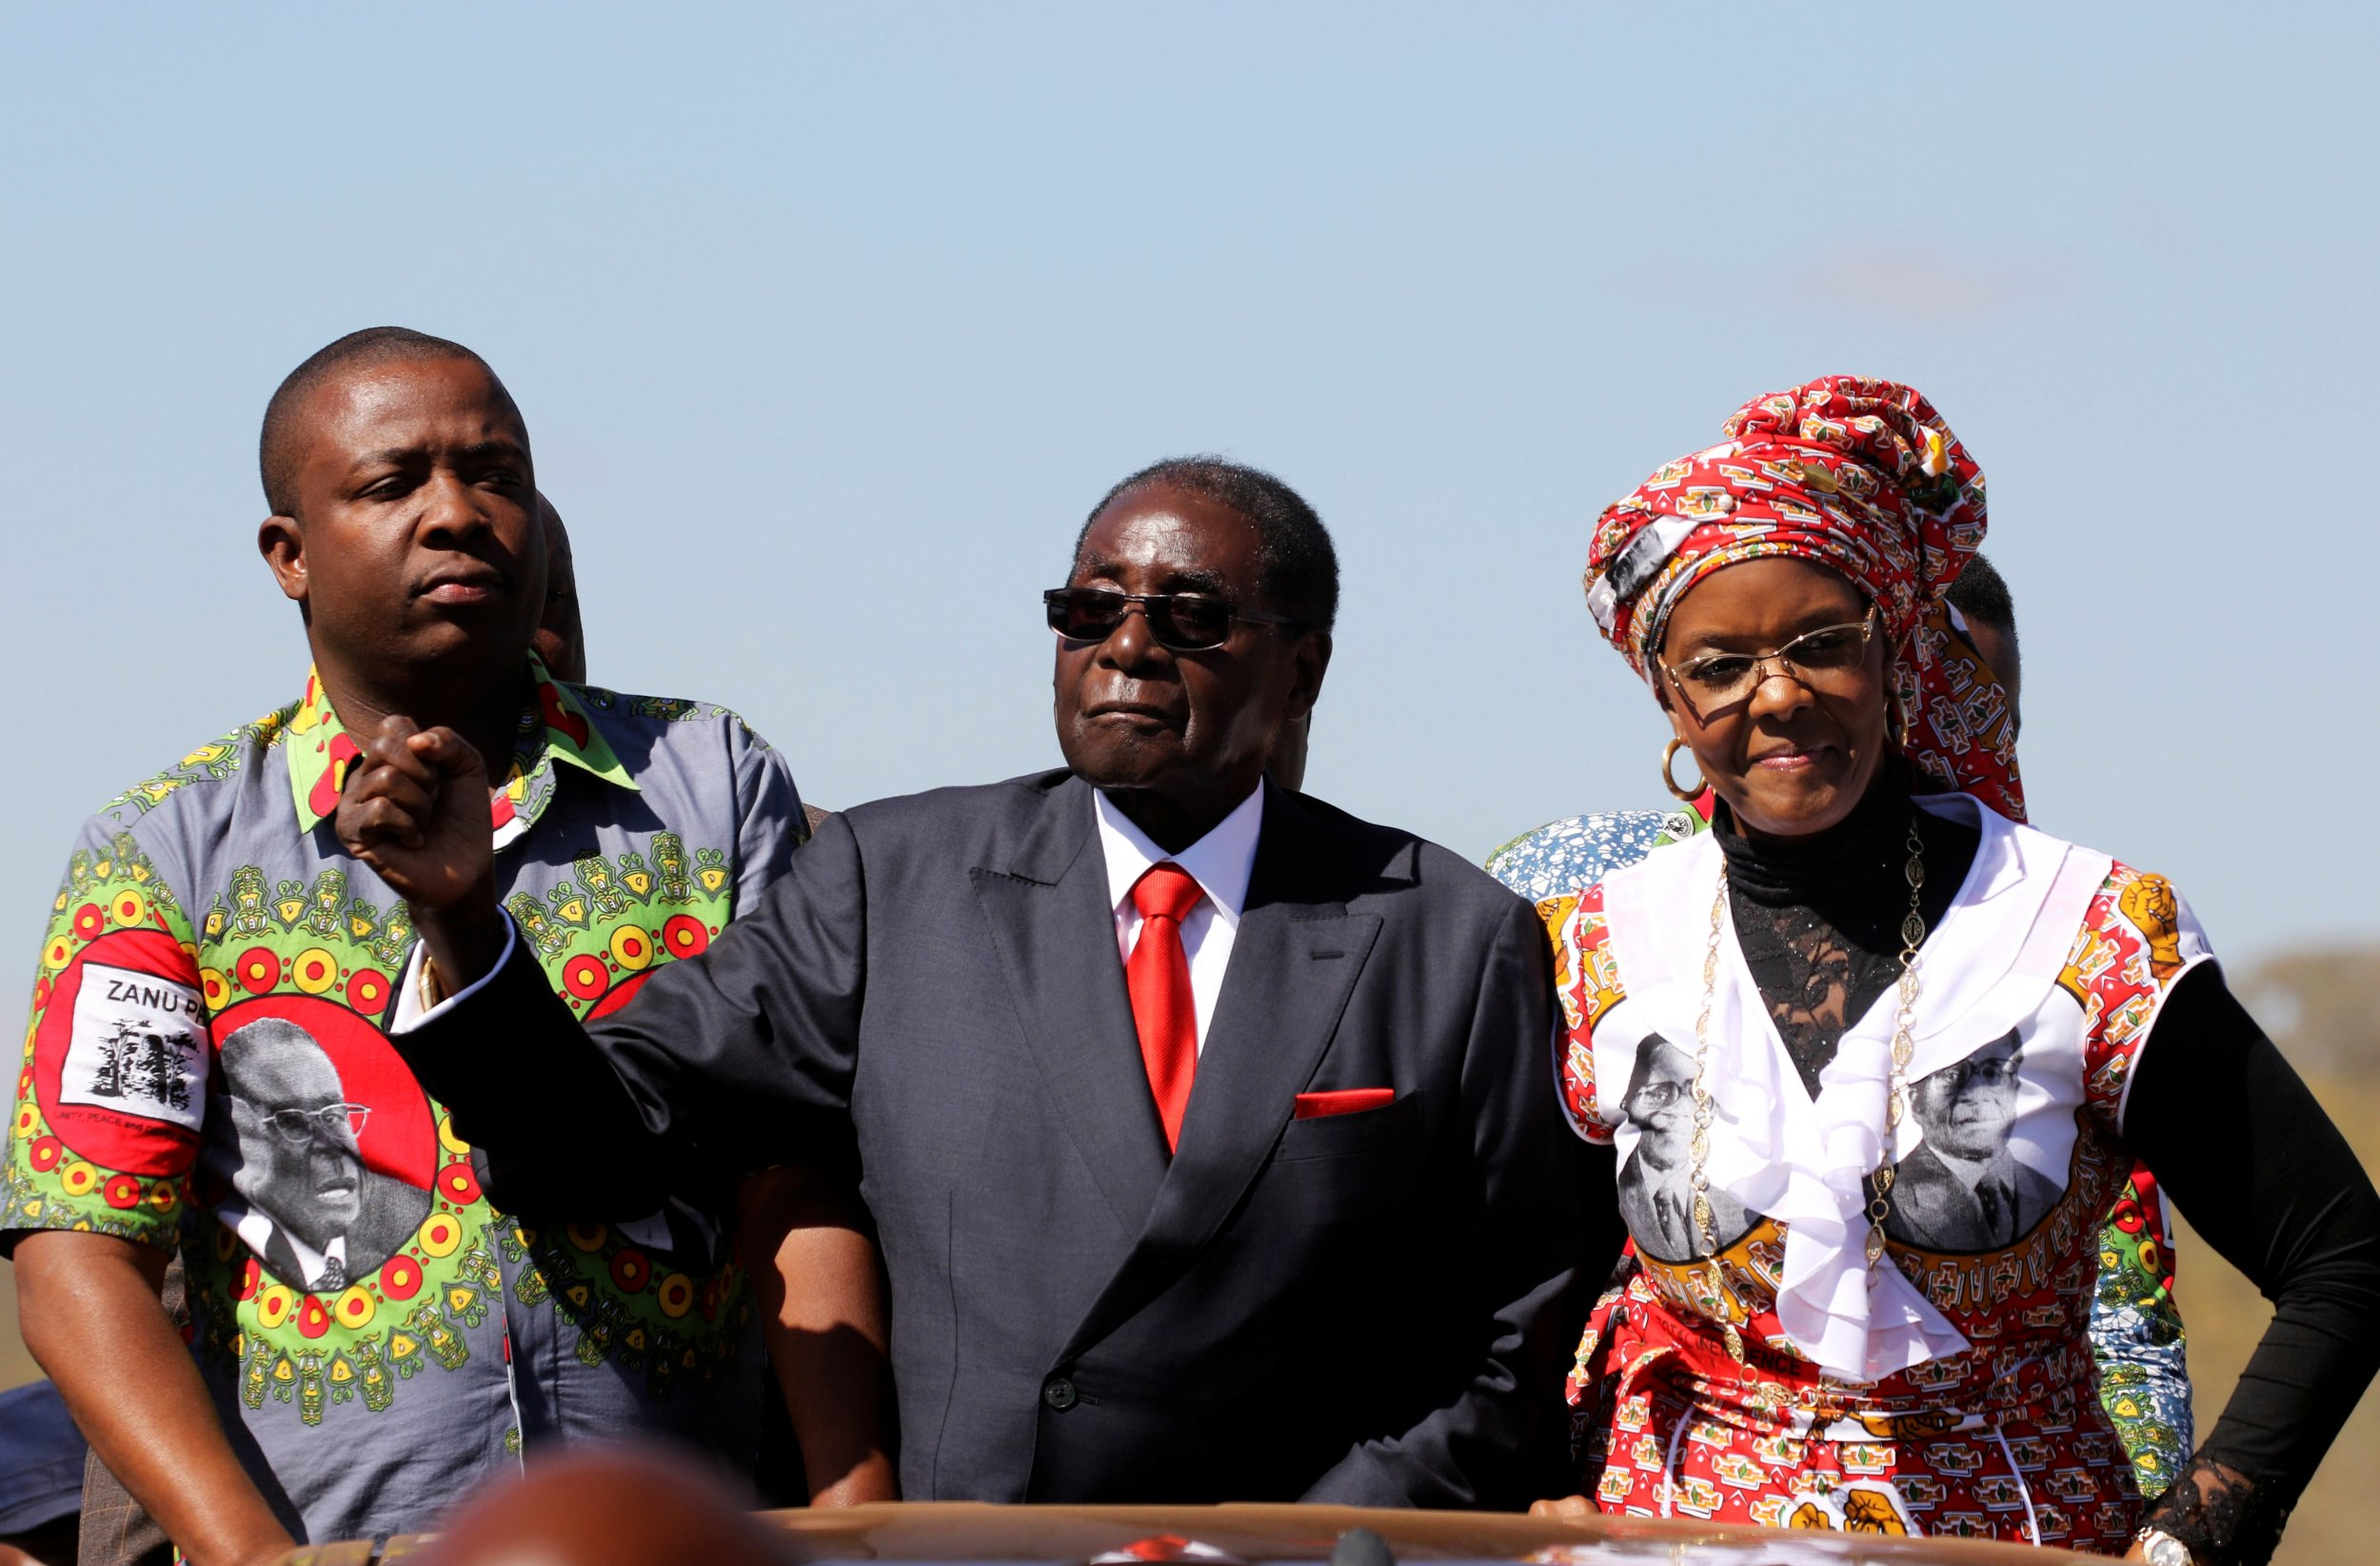 Robert and Grace Mugabe greet supporters